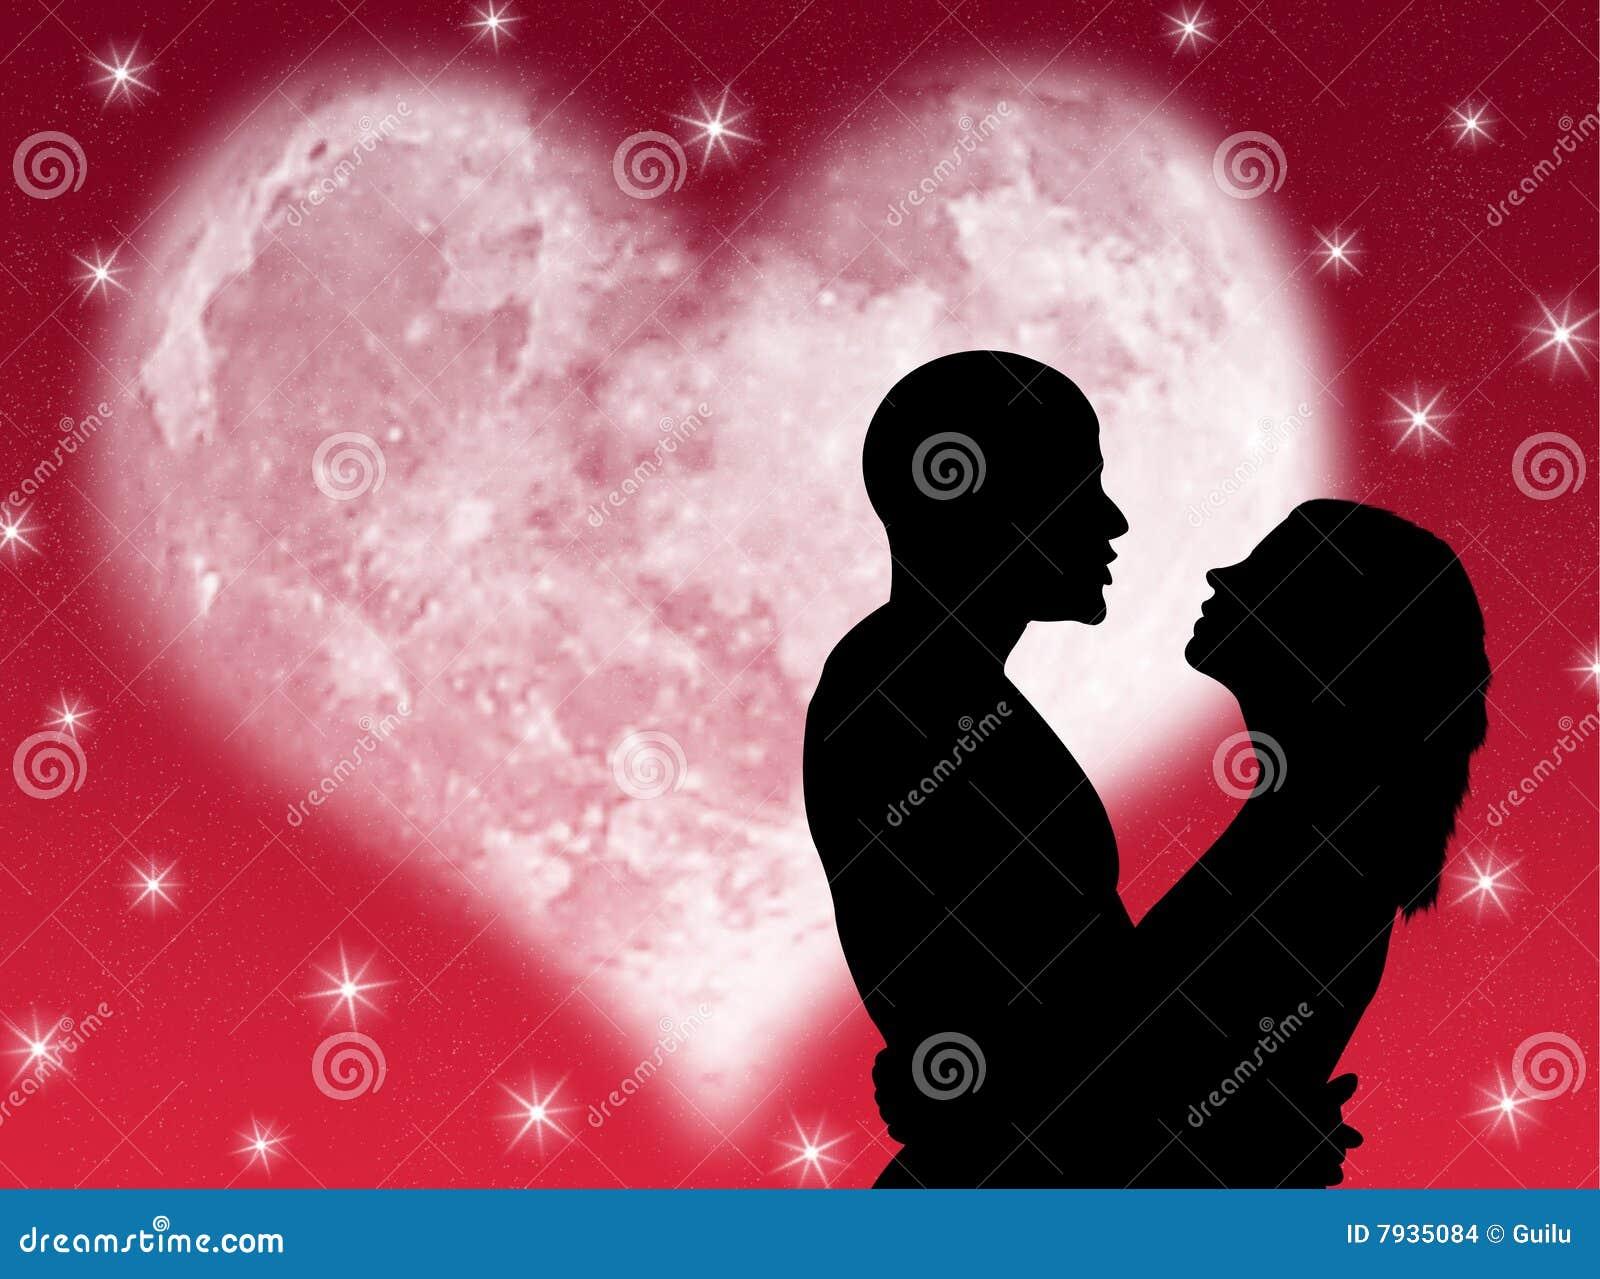 Noite dos amantes